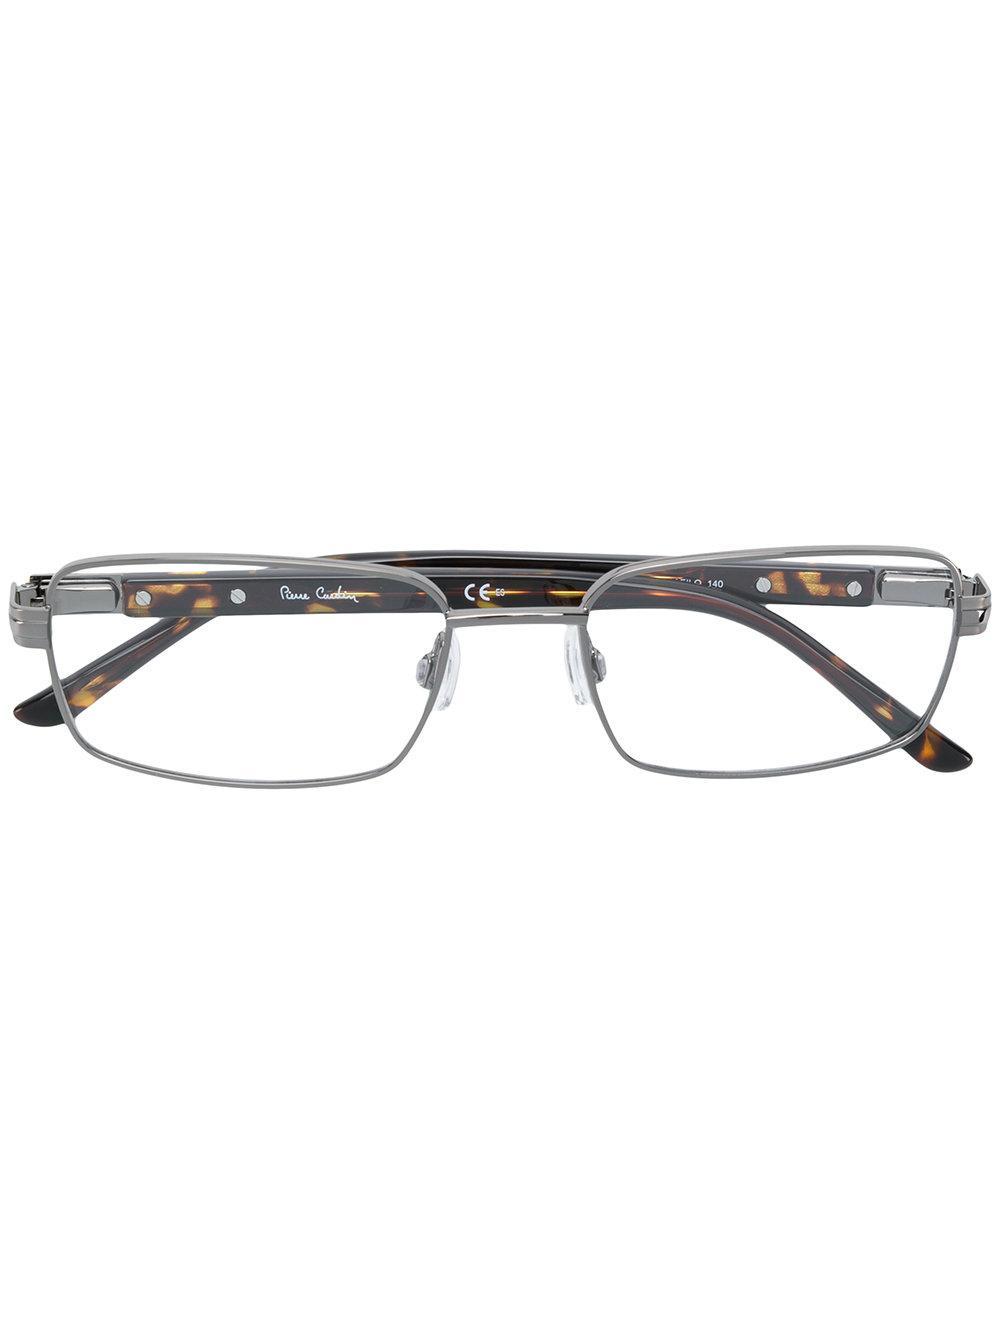 Pierre Cardin Eyewear Metallic